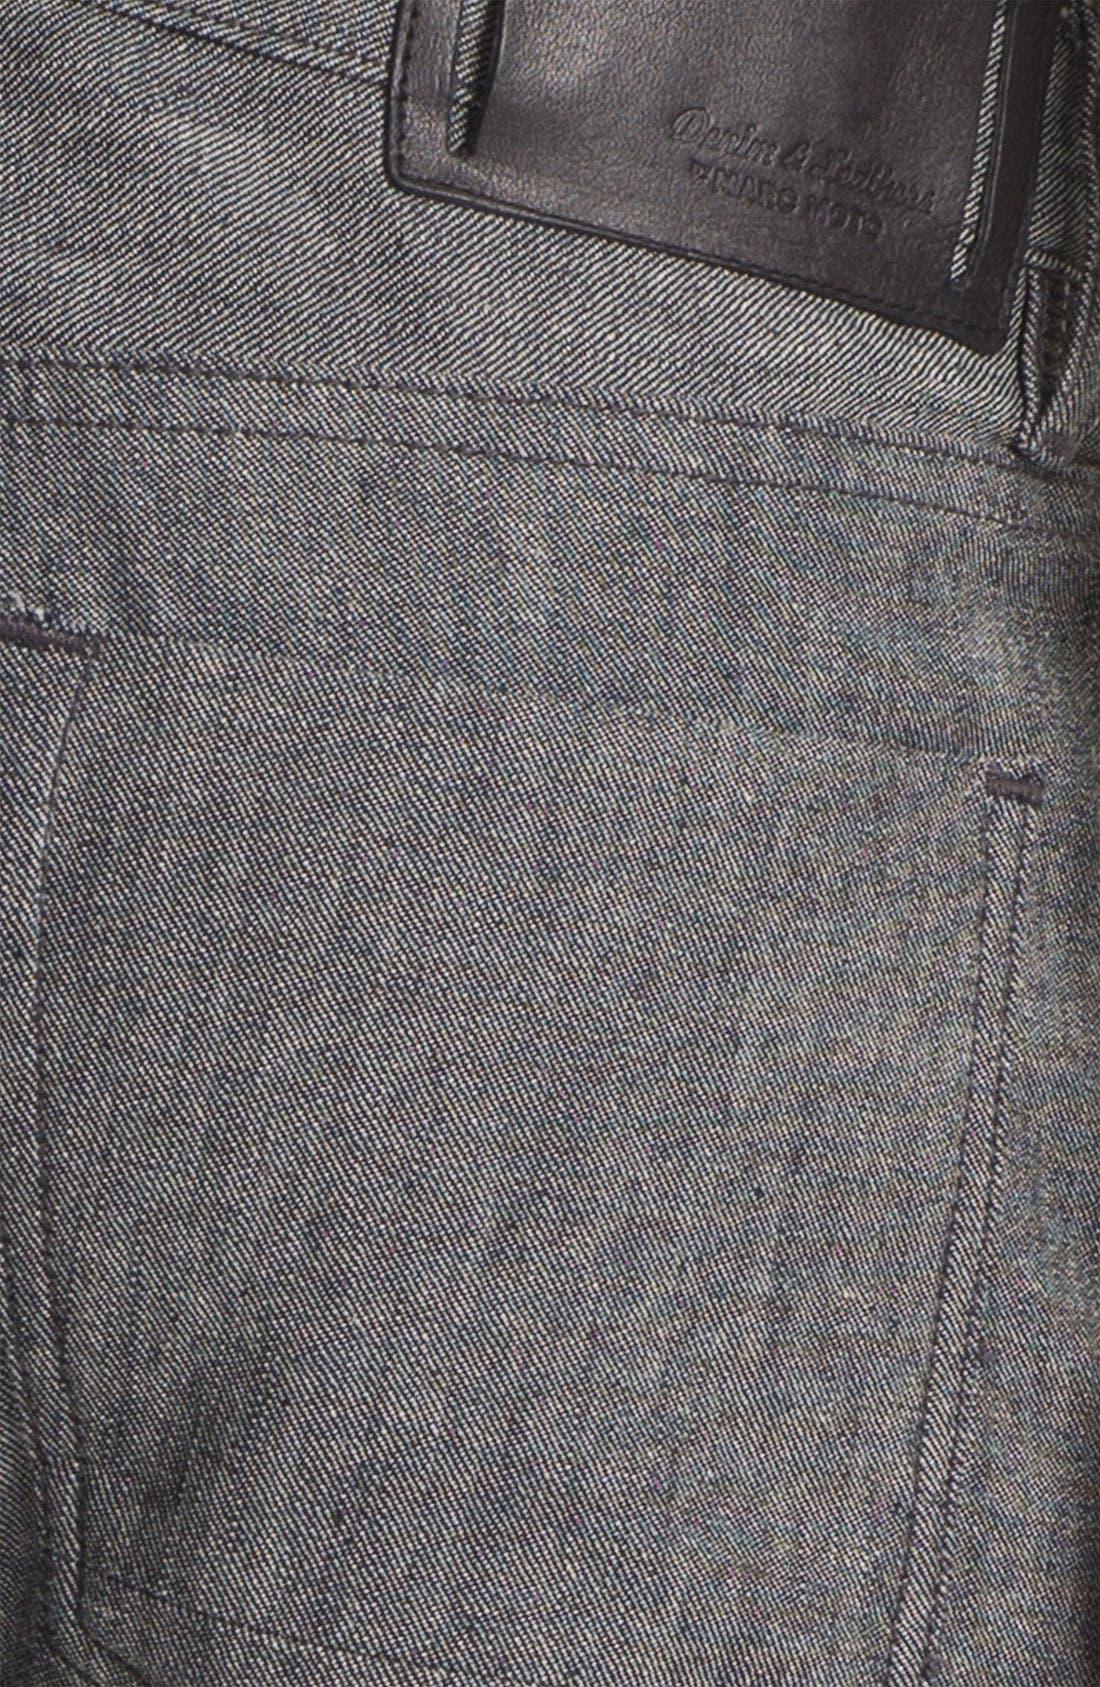 Alternate Image 4  - Denim & Leathers by Andrew Marc Tweed Slim Straight Leg Selvedge Jeans (Grey)